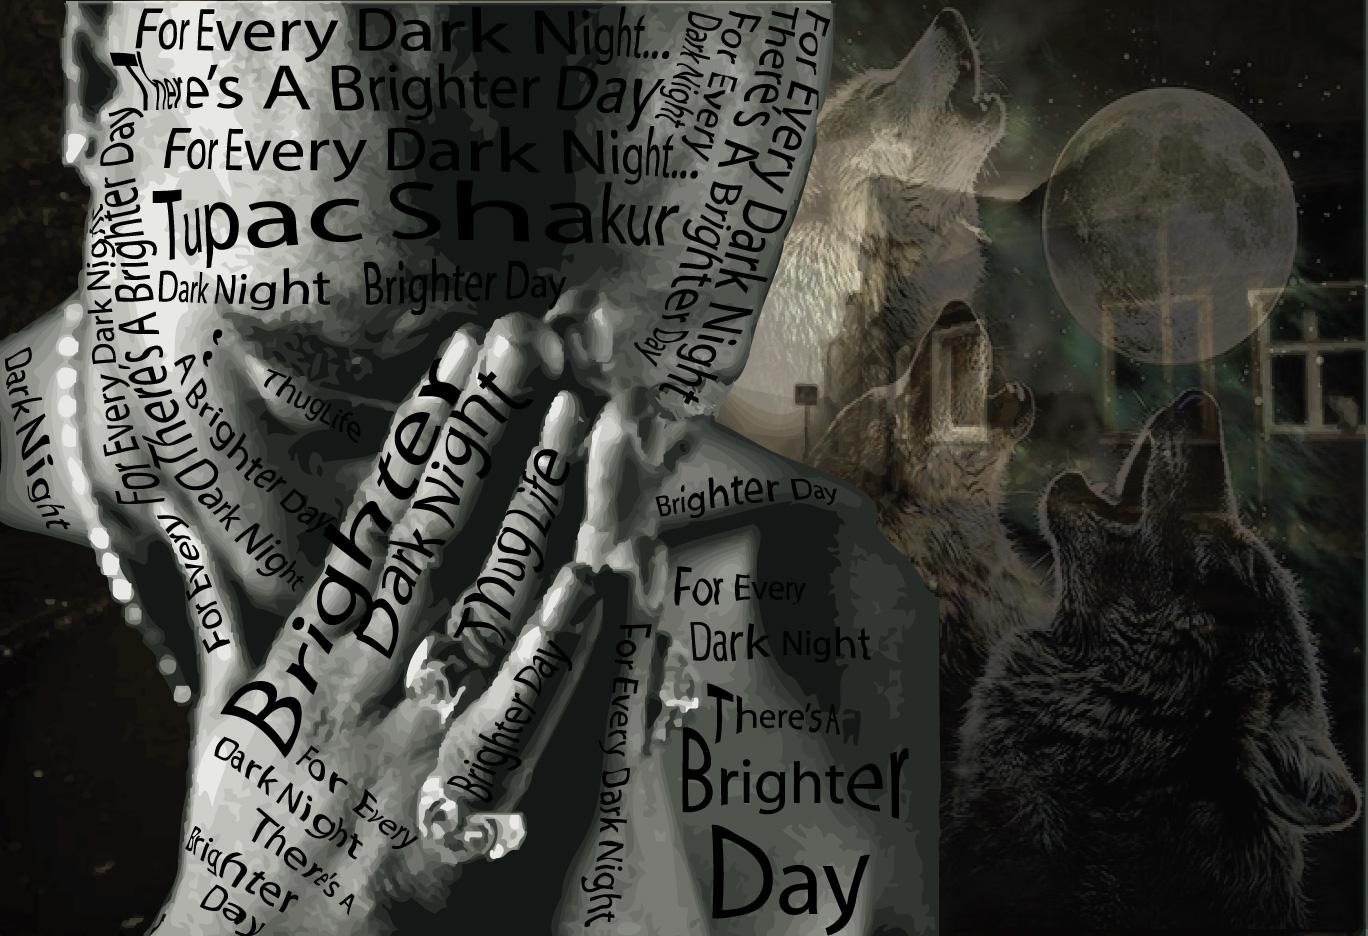 http://2.bp.blogspot.com/-Gc80MYAtDOU/TZXm6Y0dfgI/AAAAAAAAADQ/7ATA4v0DRs8/s1600/Quote-Design.jpg